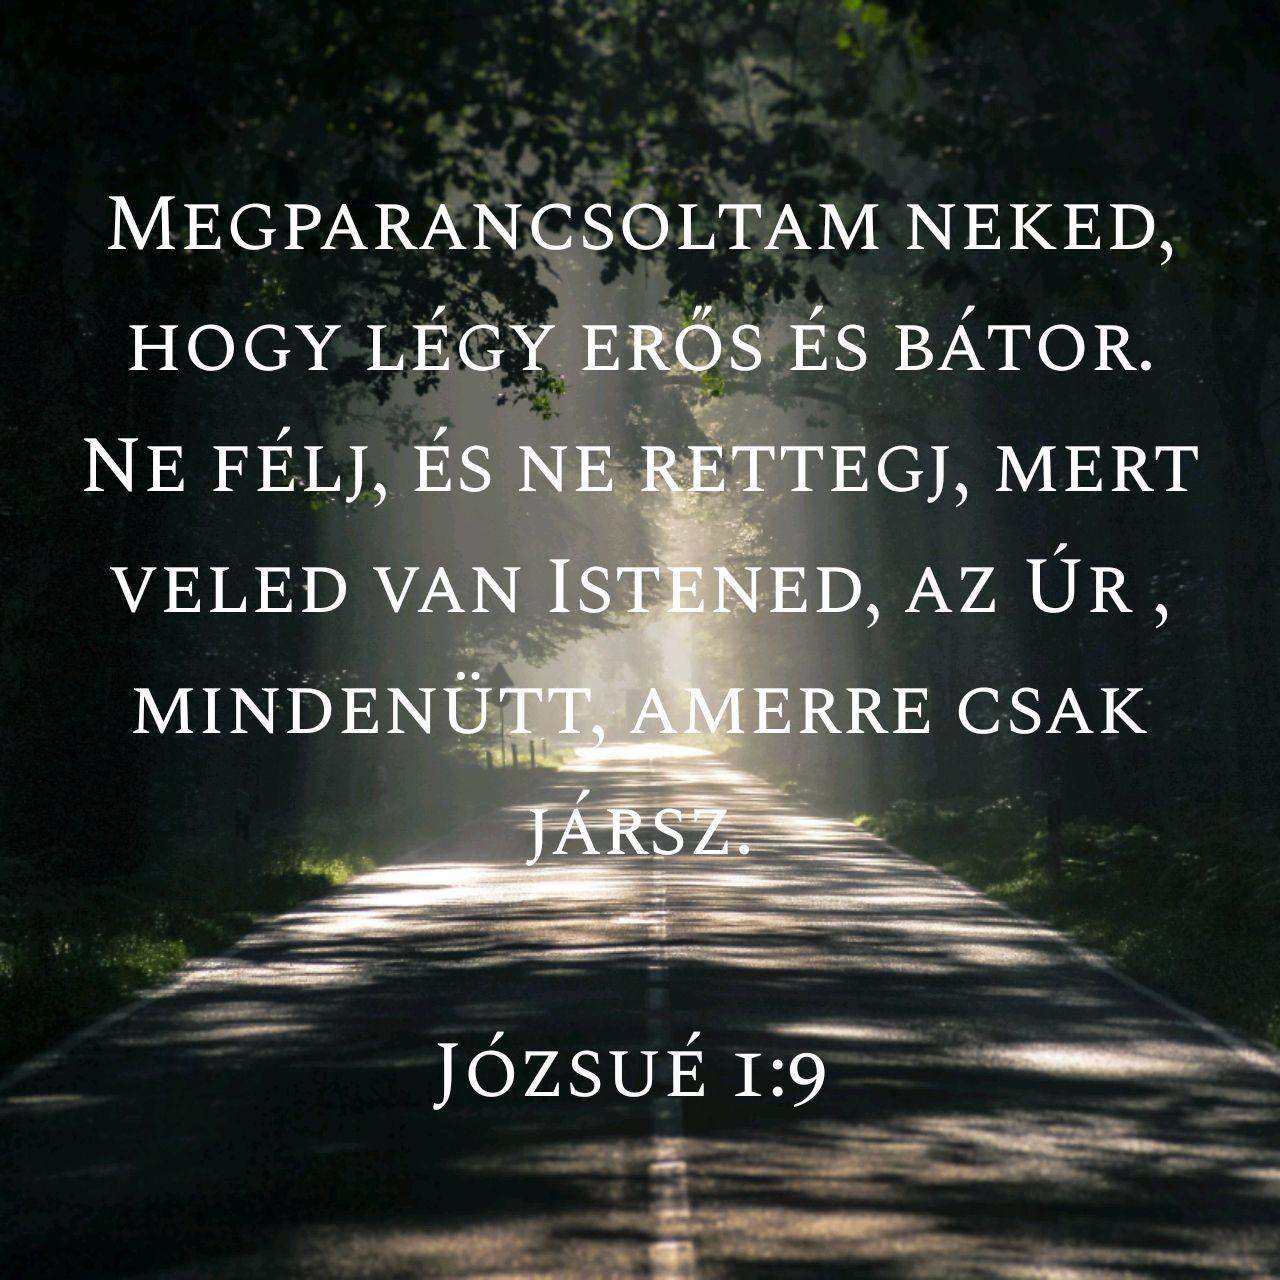 bibliai képes idézetek Isten #Biblia #ige #erő #bátorság | Prayers, Picture quotes, S quote